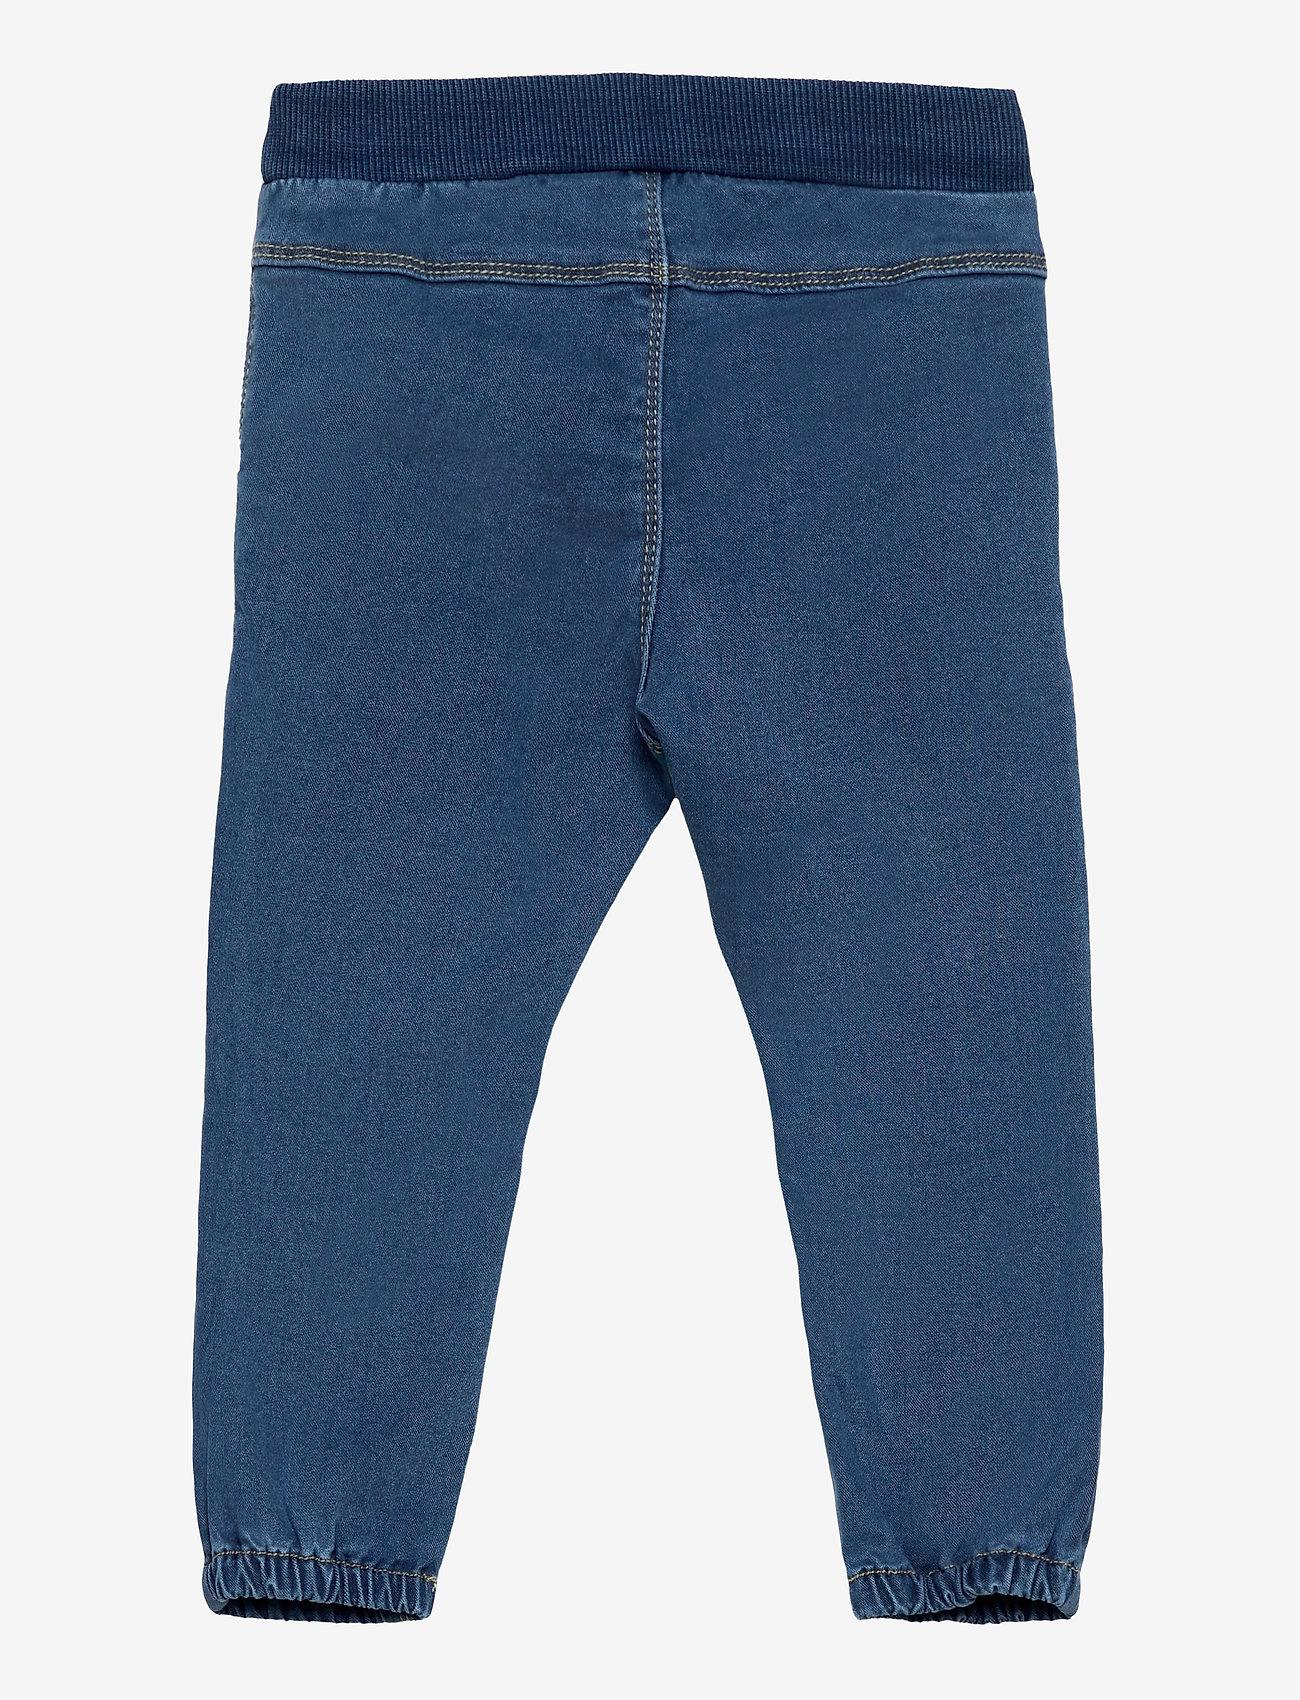 name it - NMFRIE DNMTORAS 2454 PANT NOOS - jeans - medium blue denim - 1